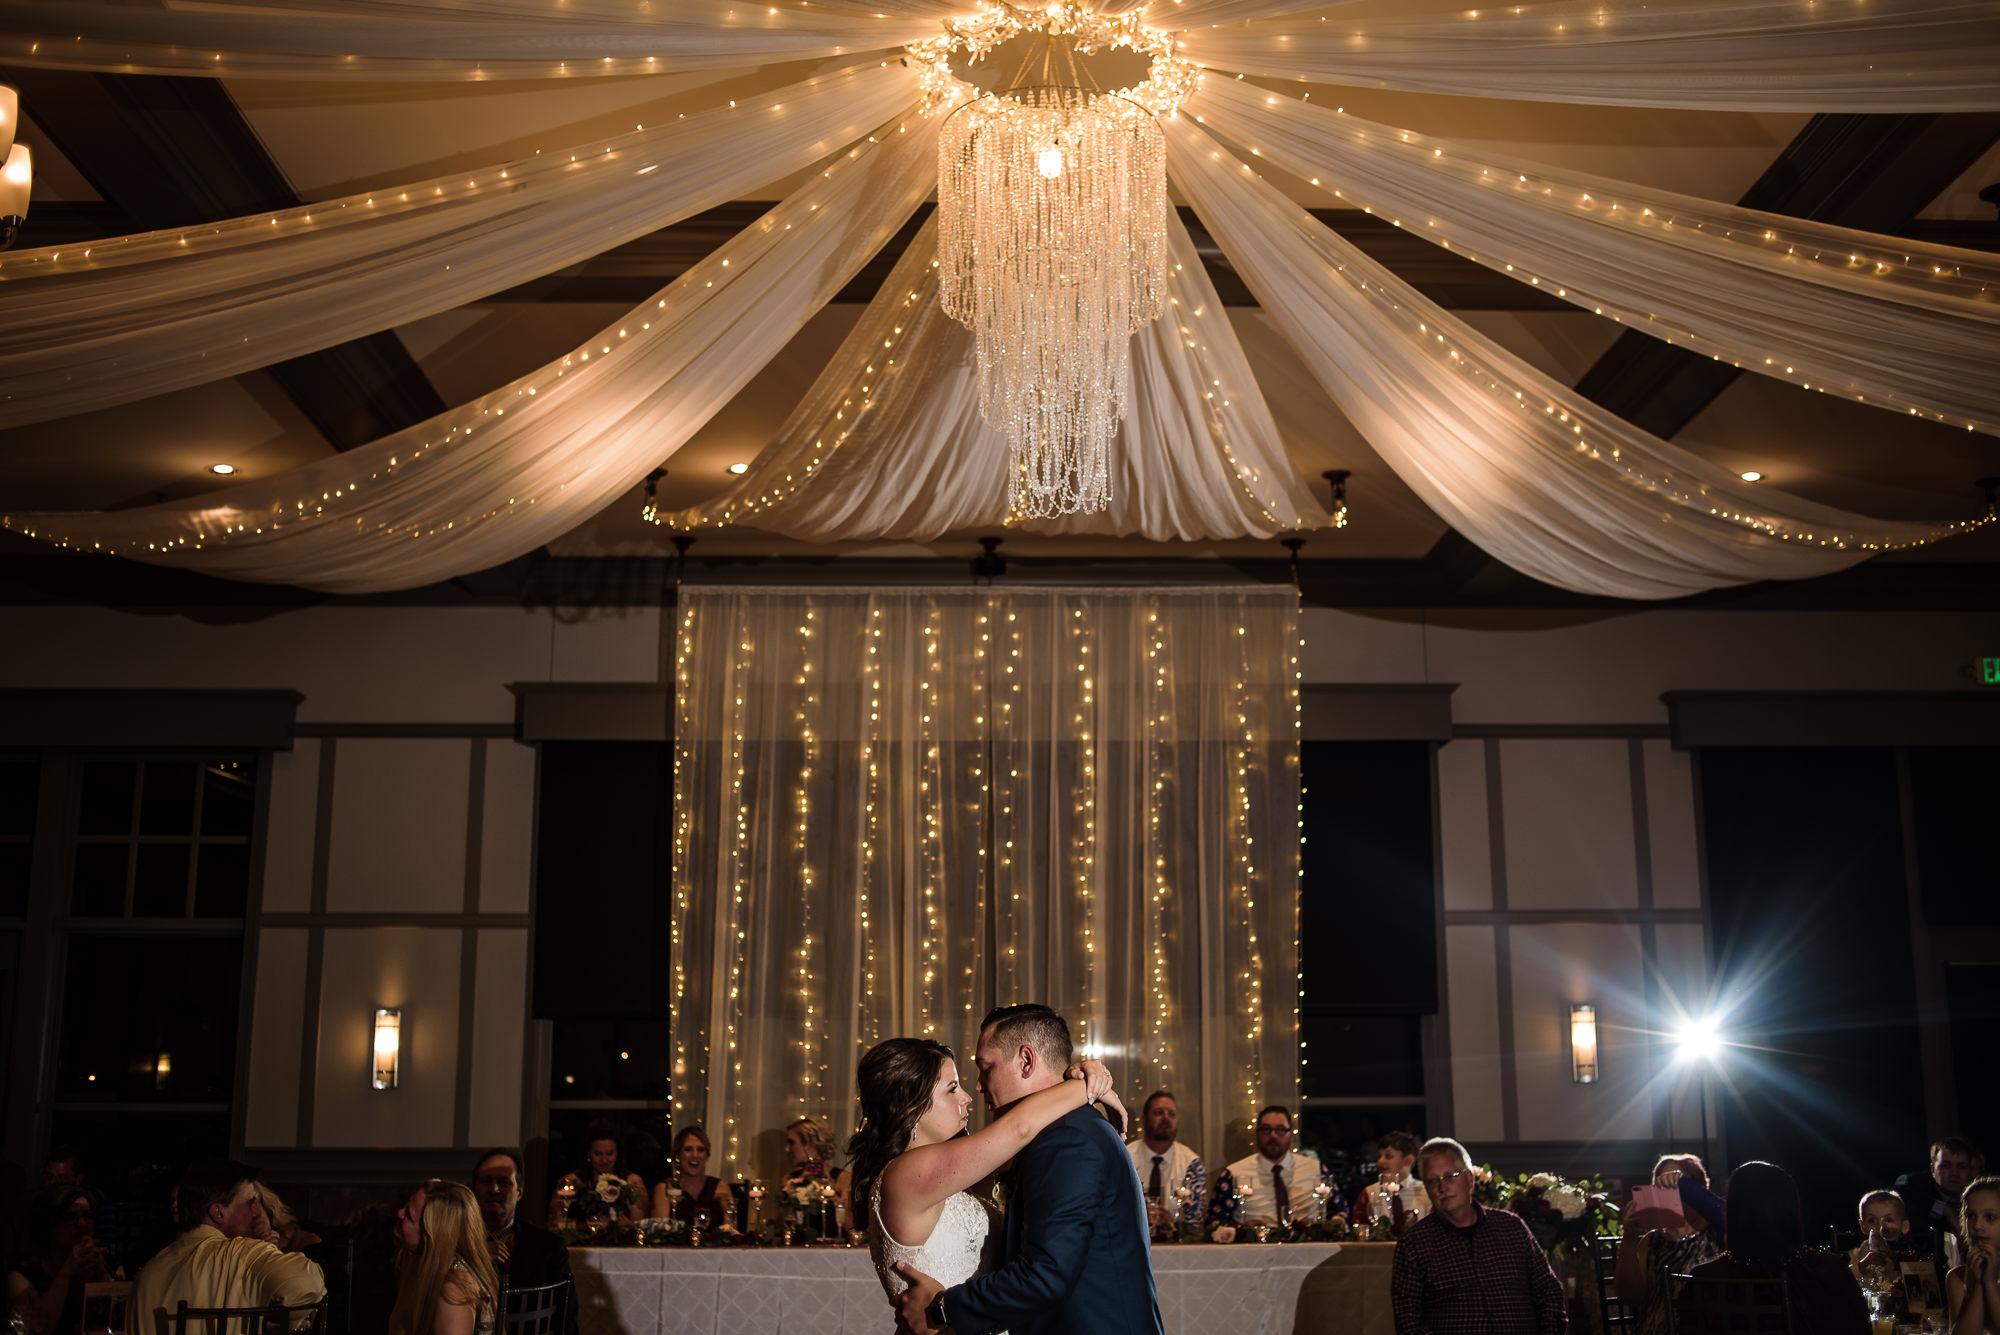 KEVIN-STACY-NOAHS-EVENT-VENUE-OMAHA-WEDDING-PHOTOGRAPHER-028.jpg